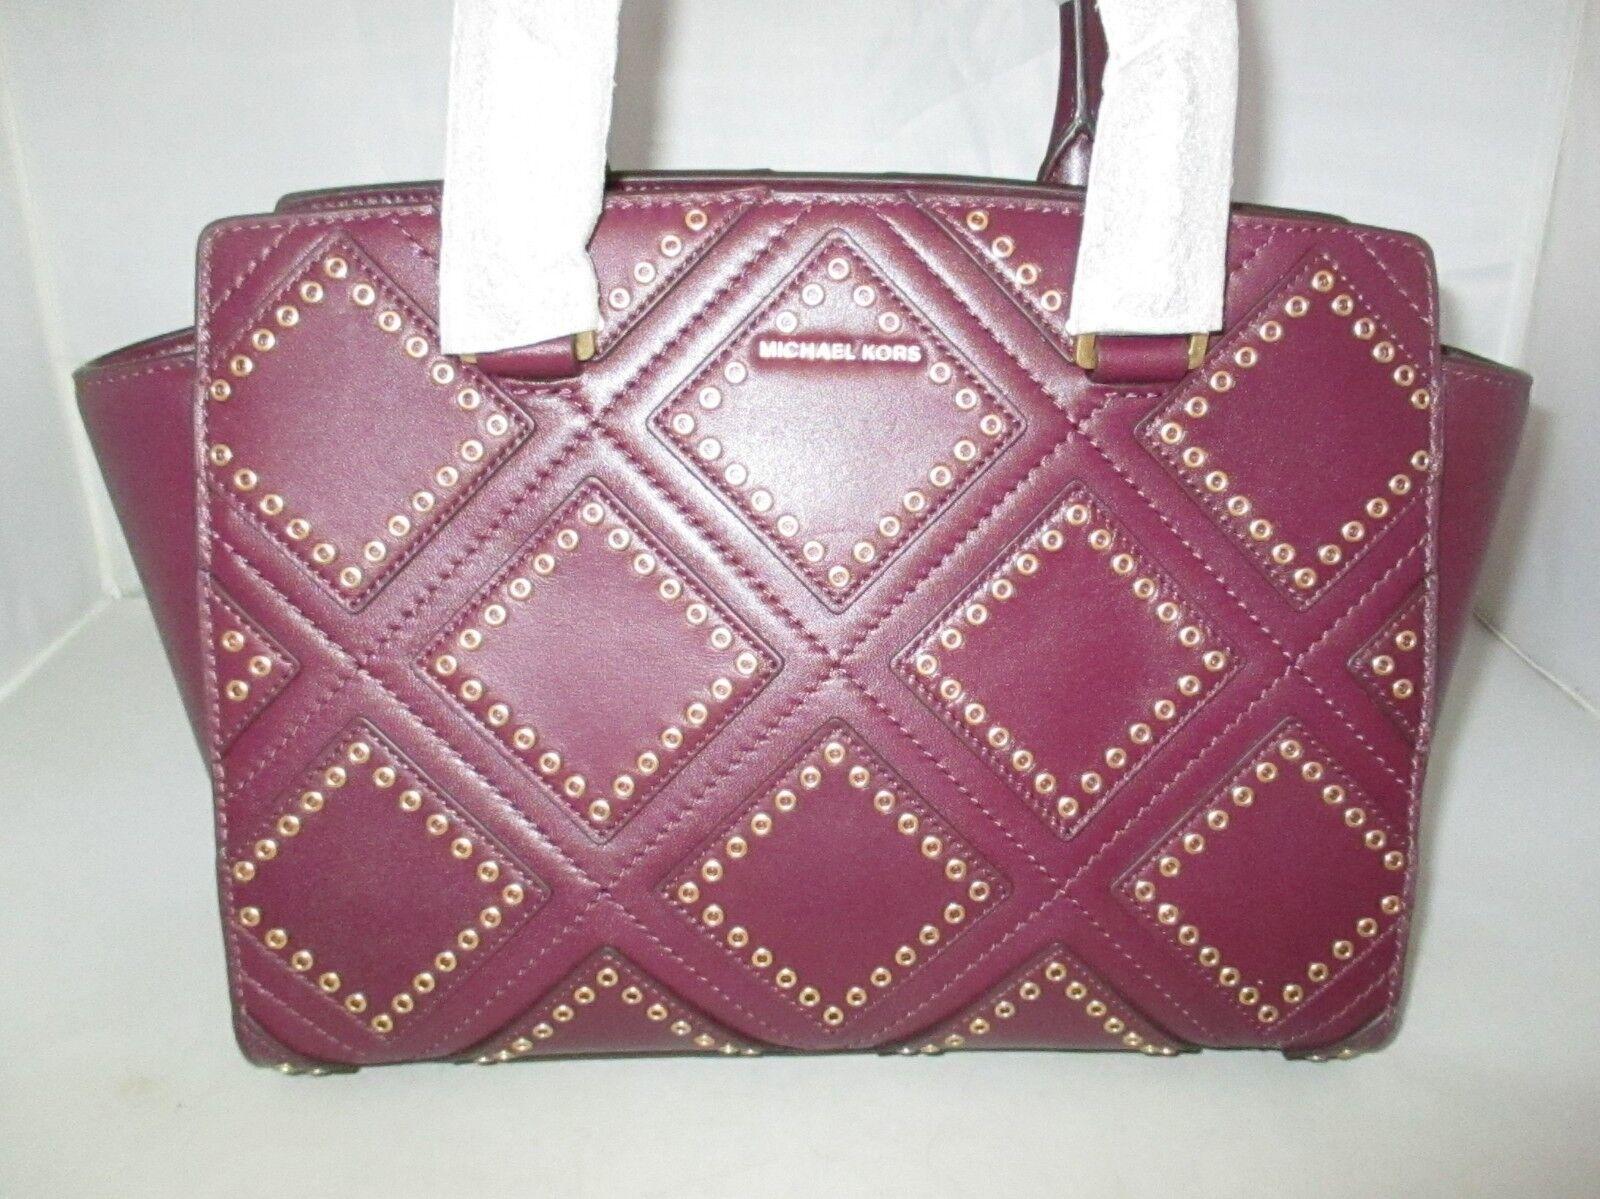 Michael Kors Plum Diamond Grommet 30f6adxs2l Medium Leather Satchel Selma Lilac Authentic Ebay